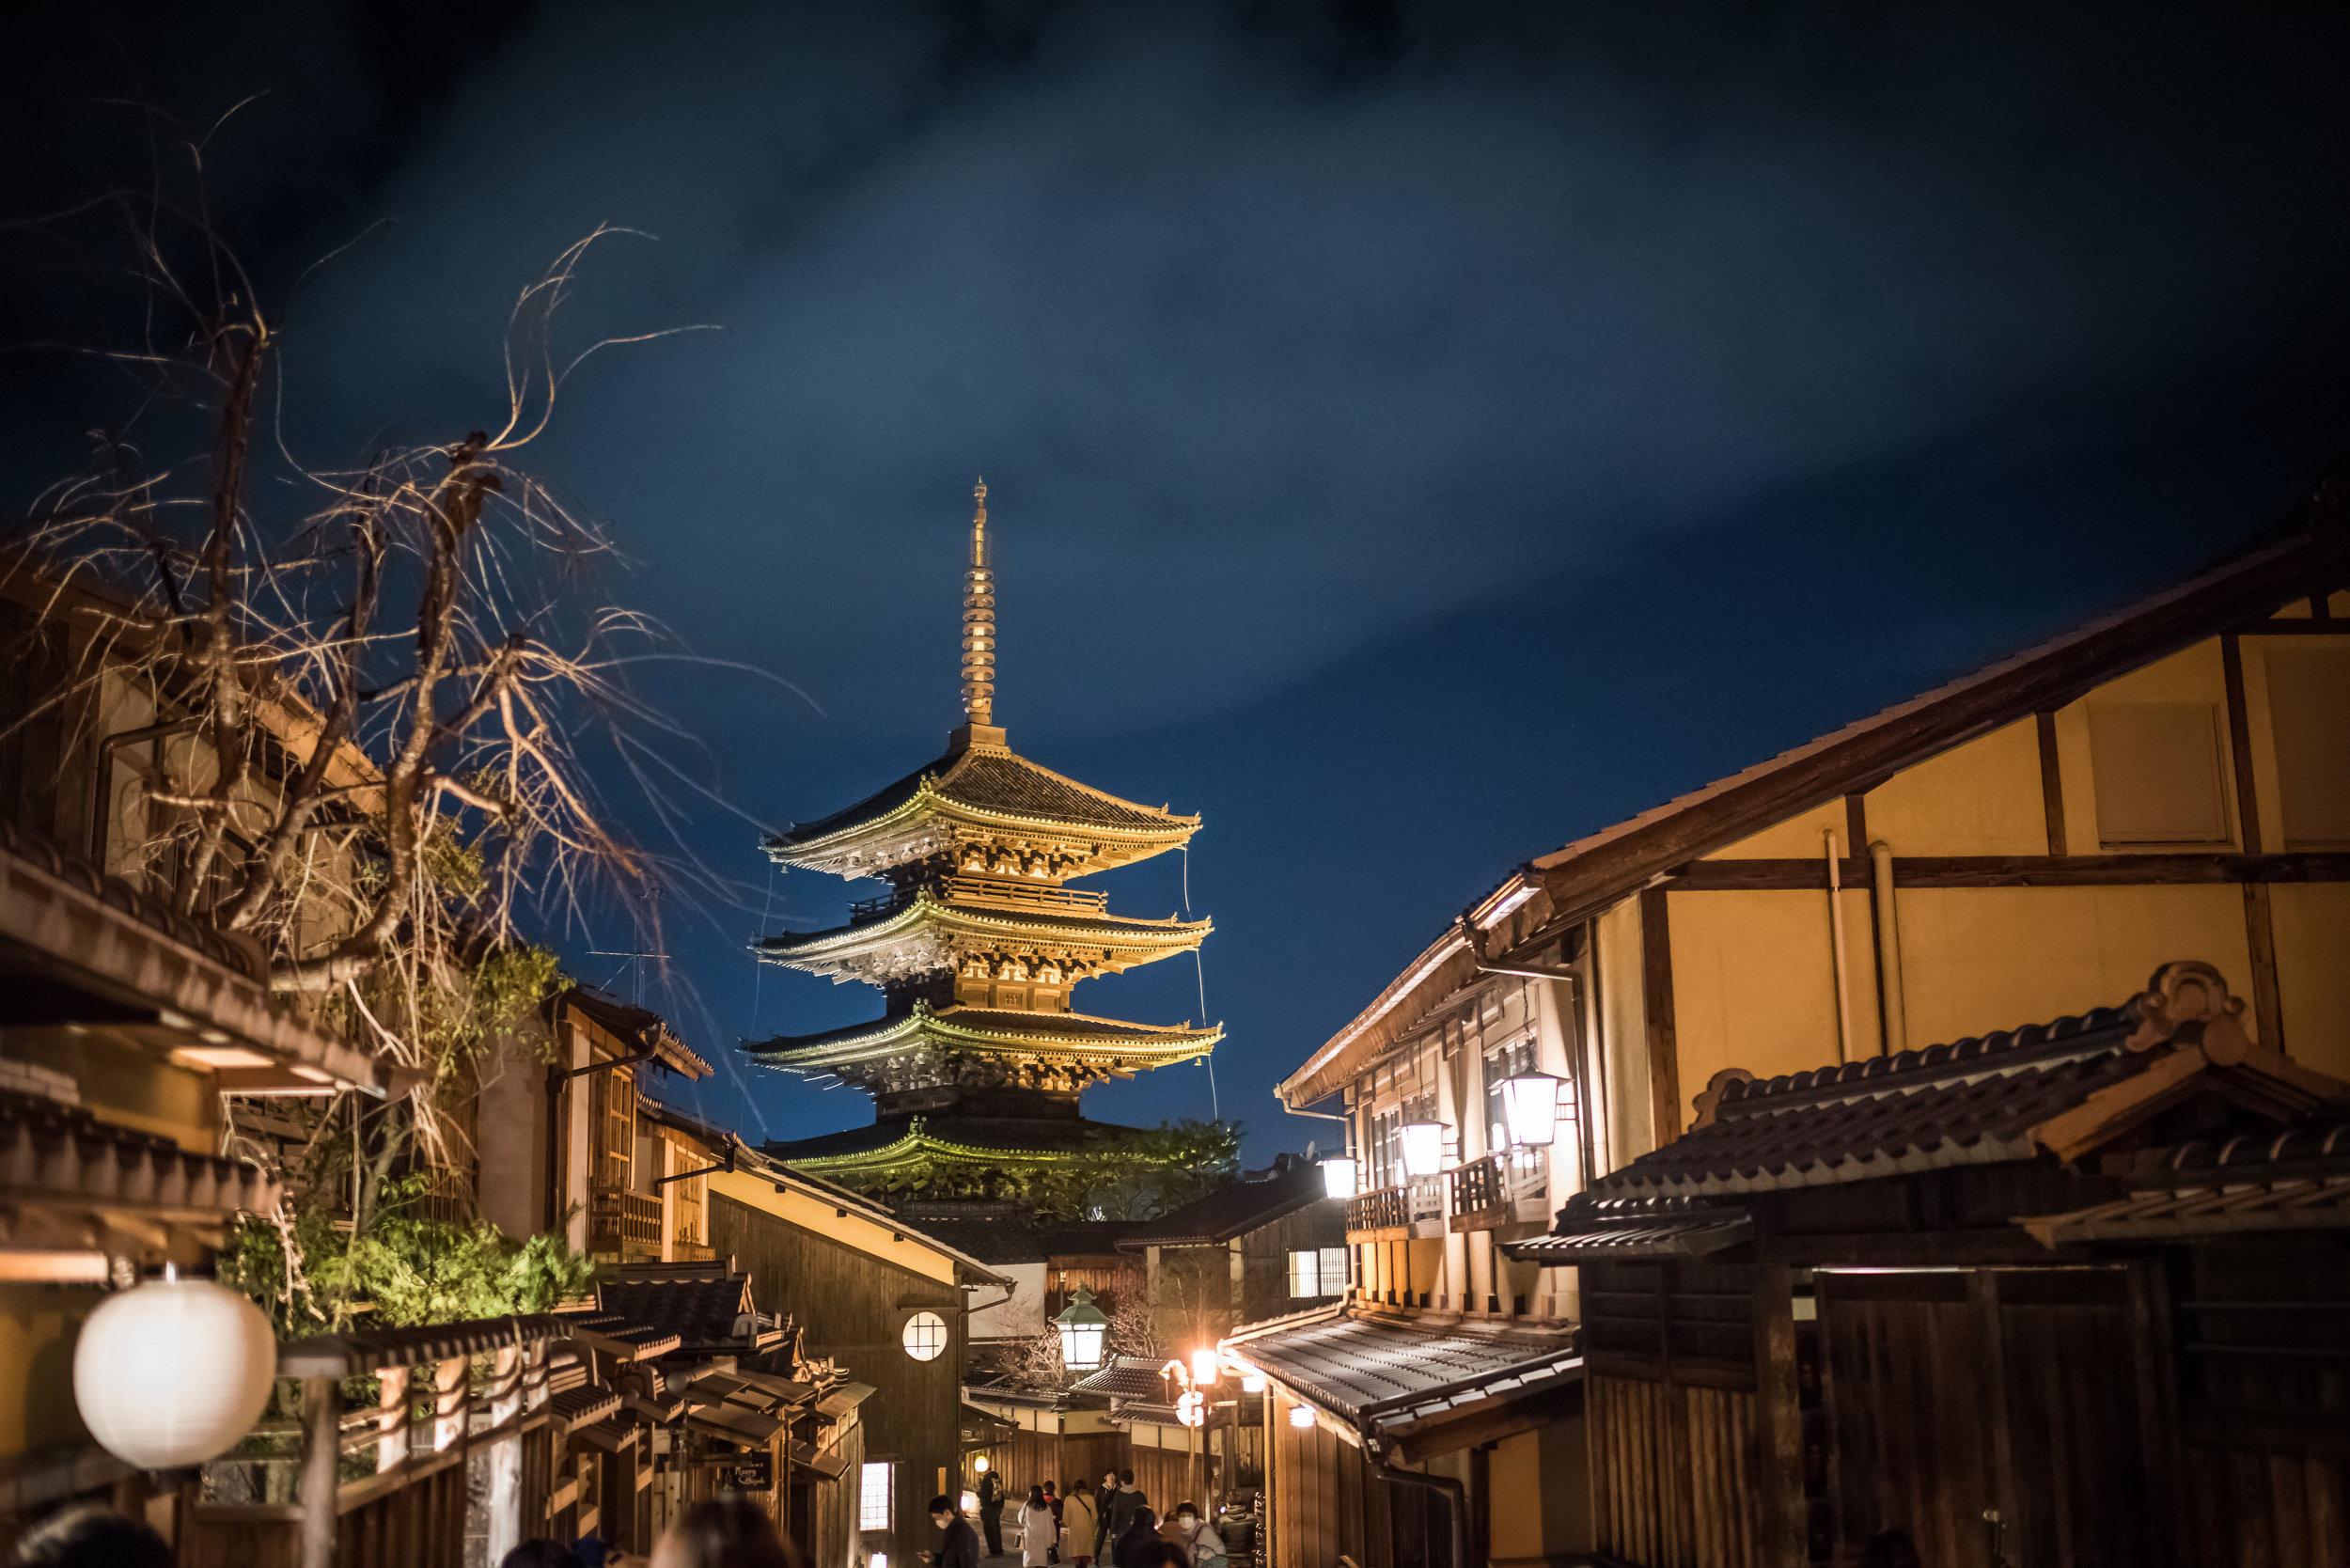 Kyoto, Japan (2019)